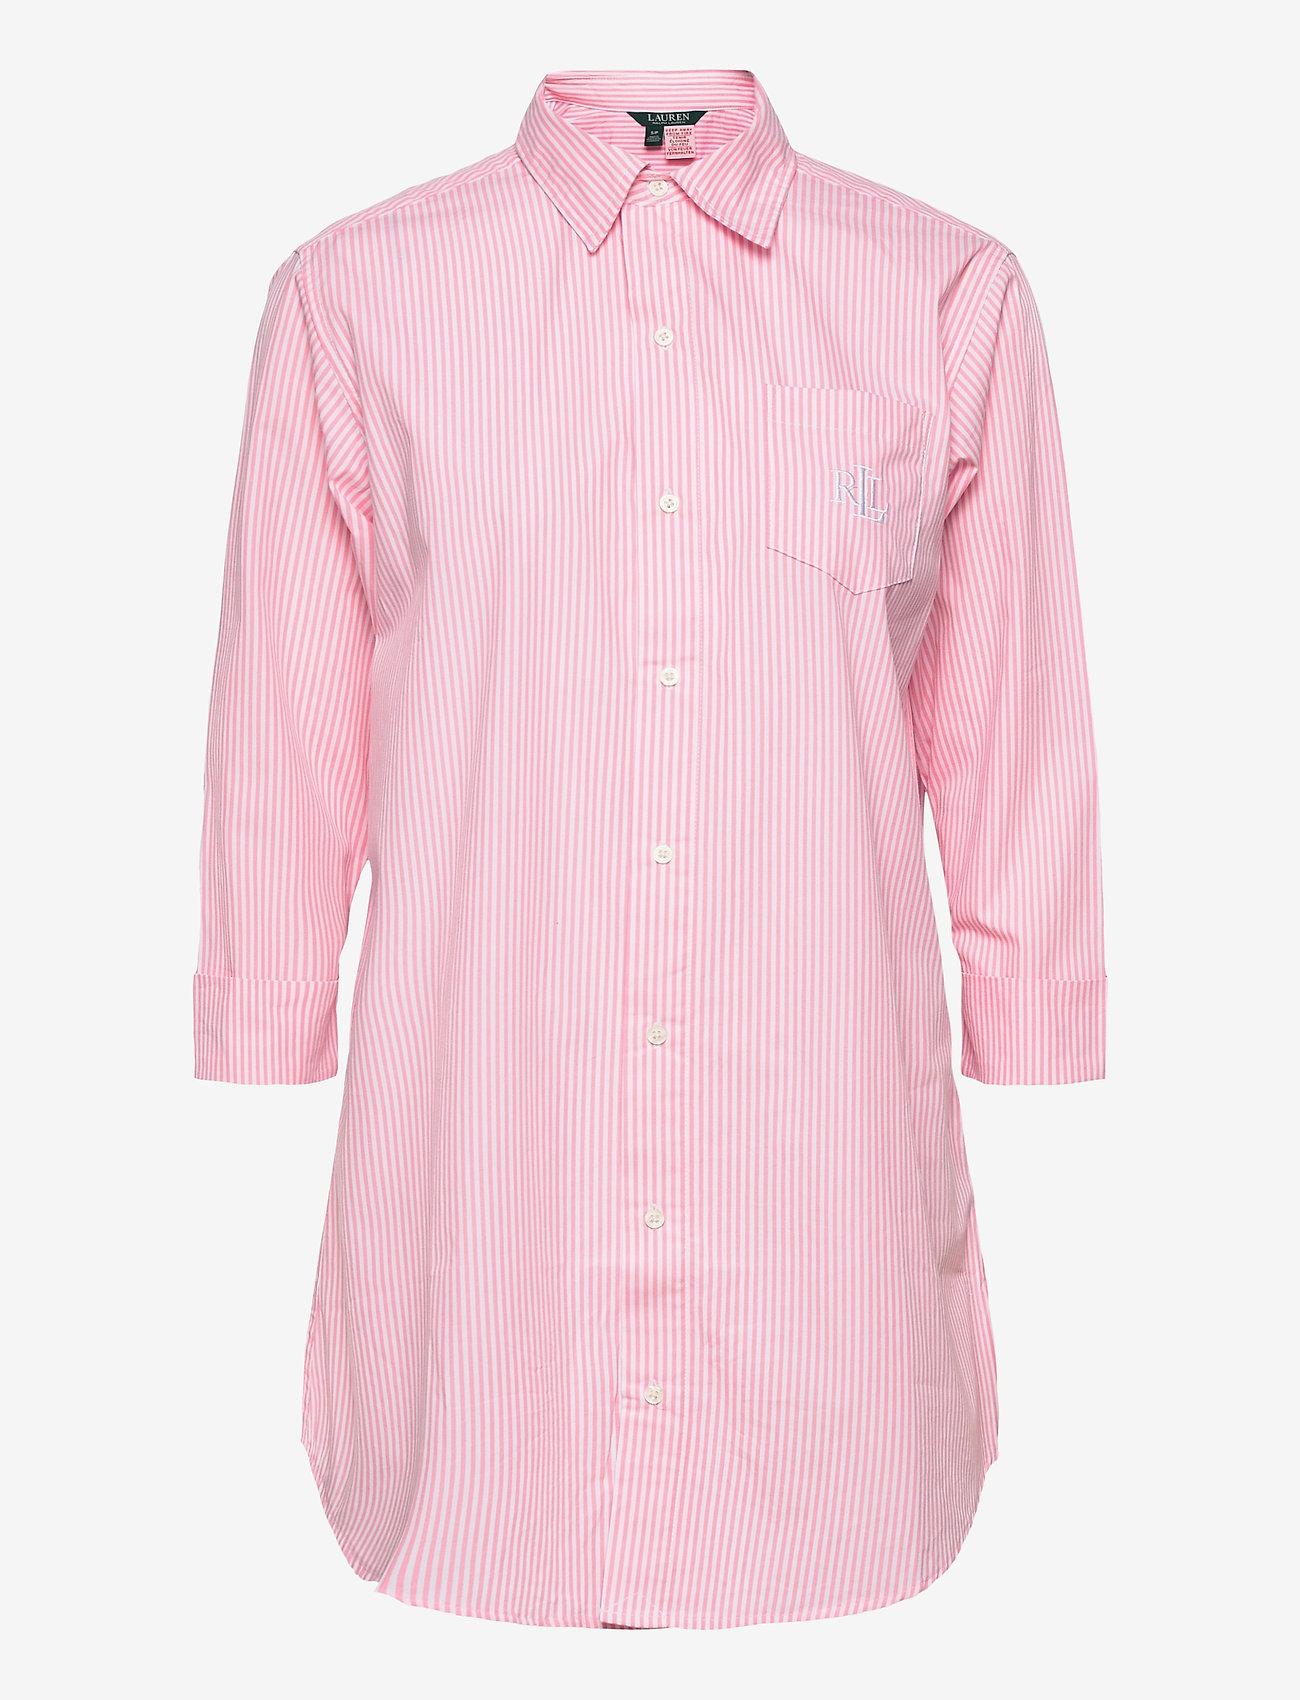 Lauren Ralph Lauren Homewear - LRL HERITAGE ESS. 3/4 SL SLEEPSHIRT - overdele - pink/white stripe - 0